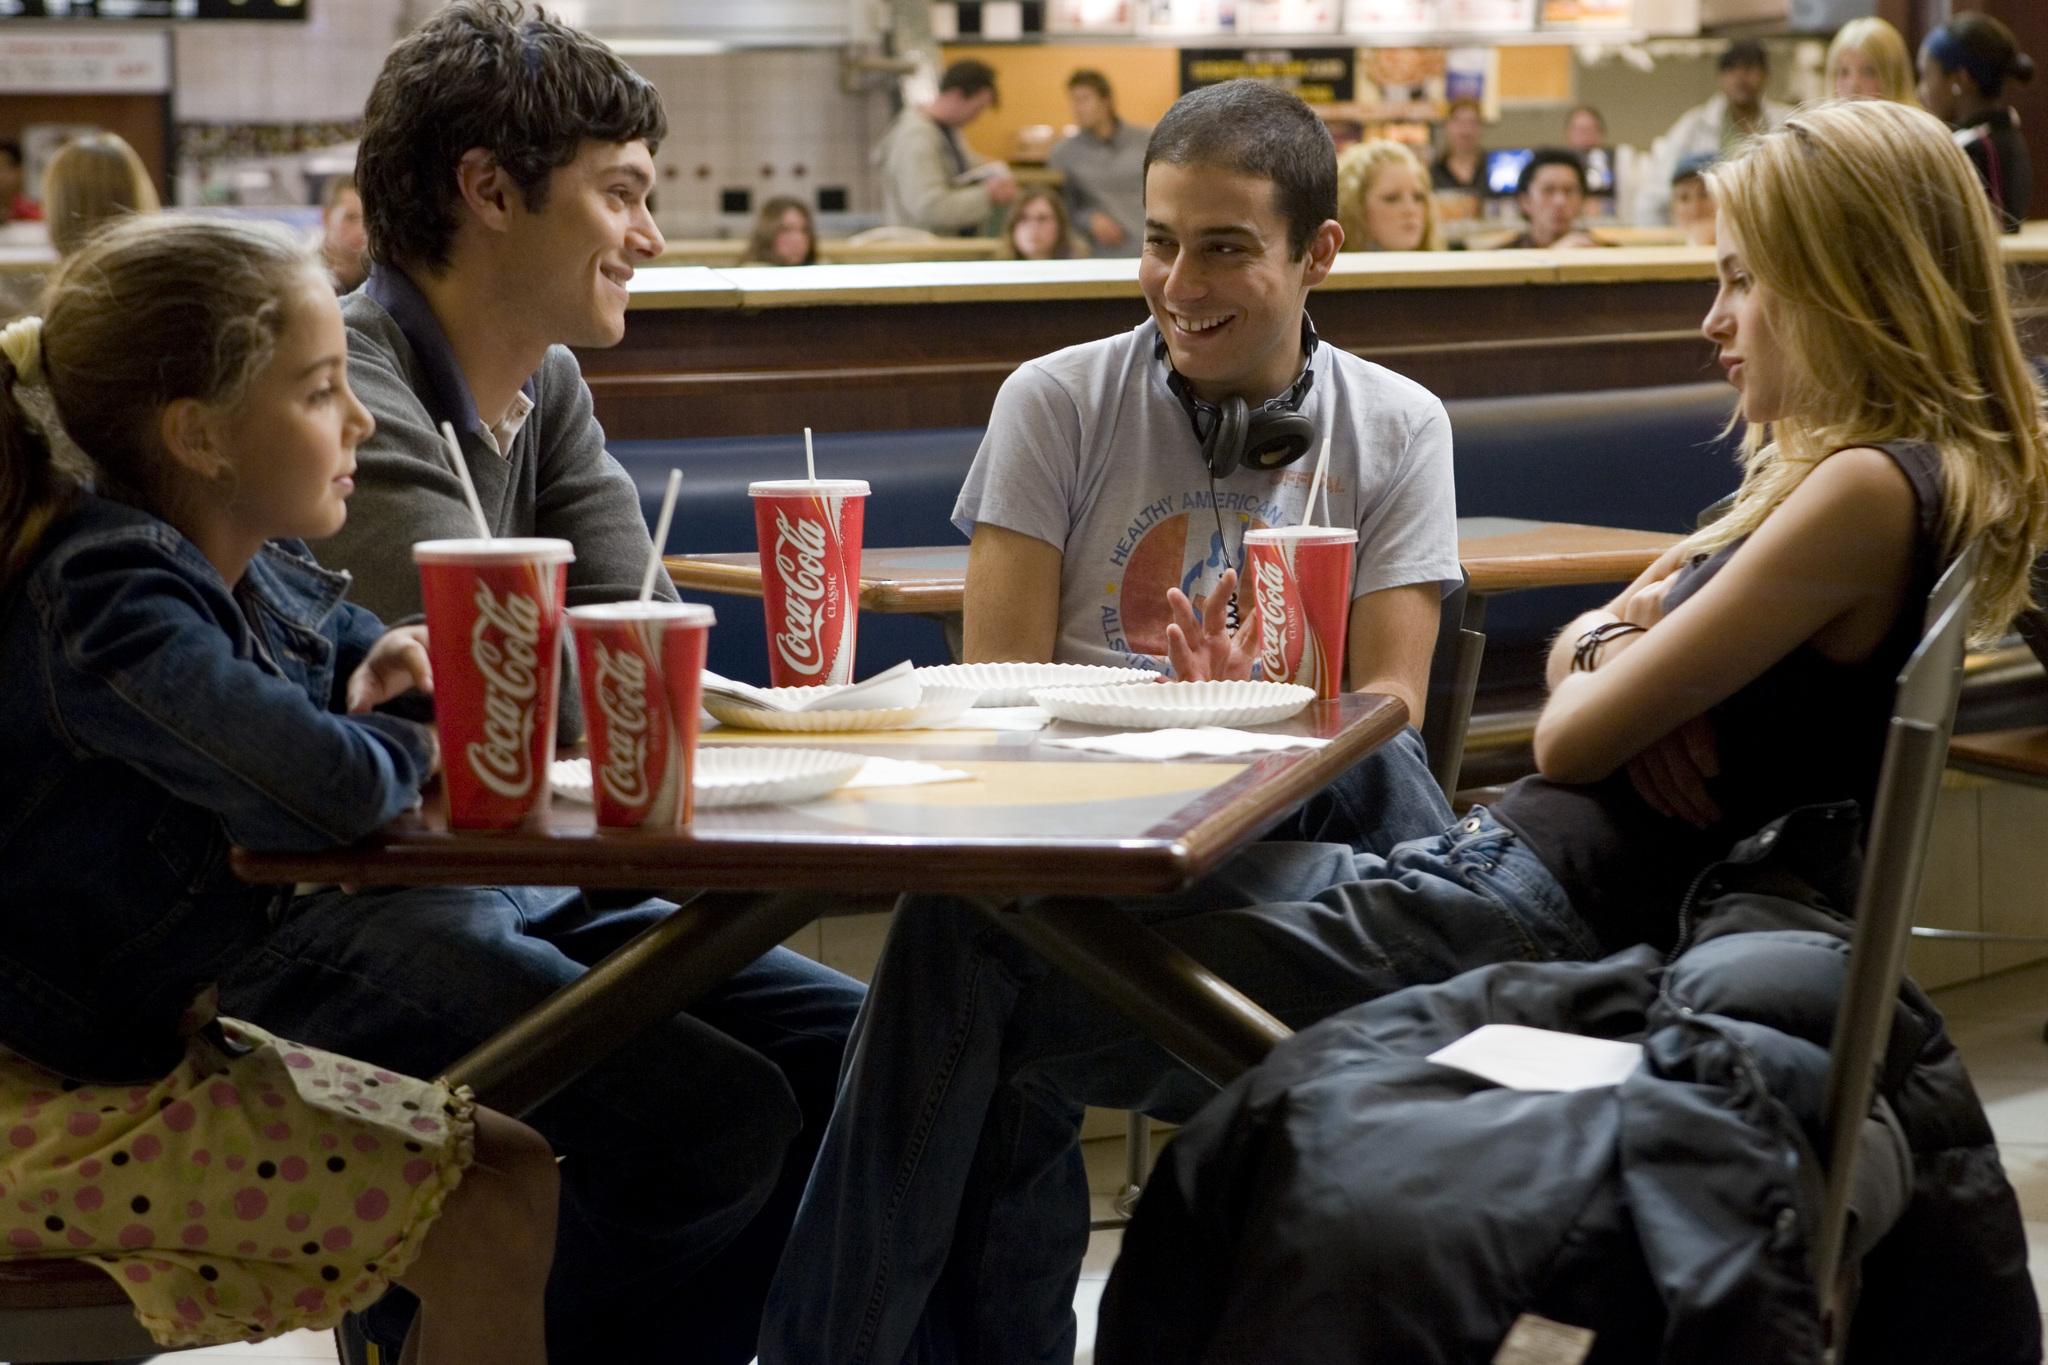 Adam Brody, Jonathan Kasdan, Kristen Stewart, and Makenzie Vega in In the Land of Women (2007)